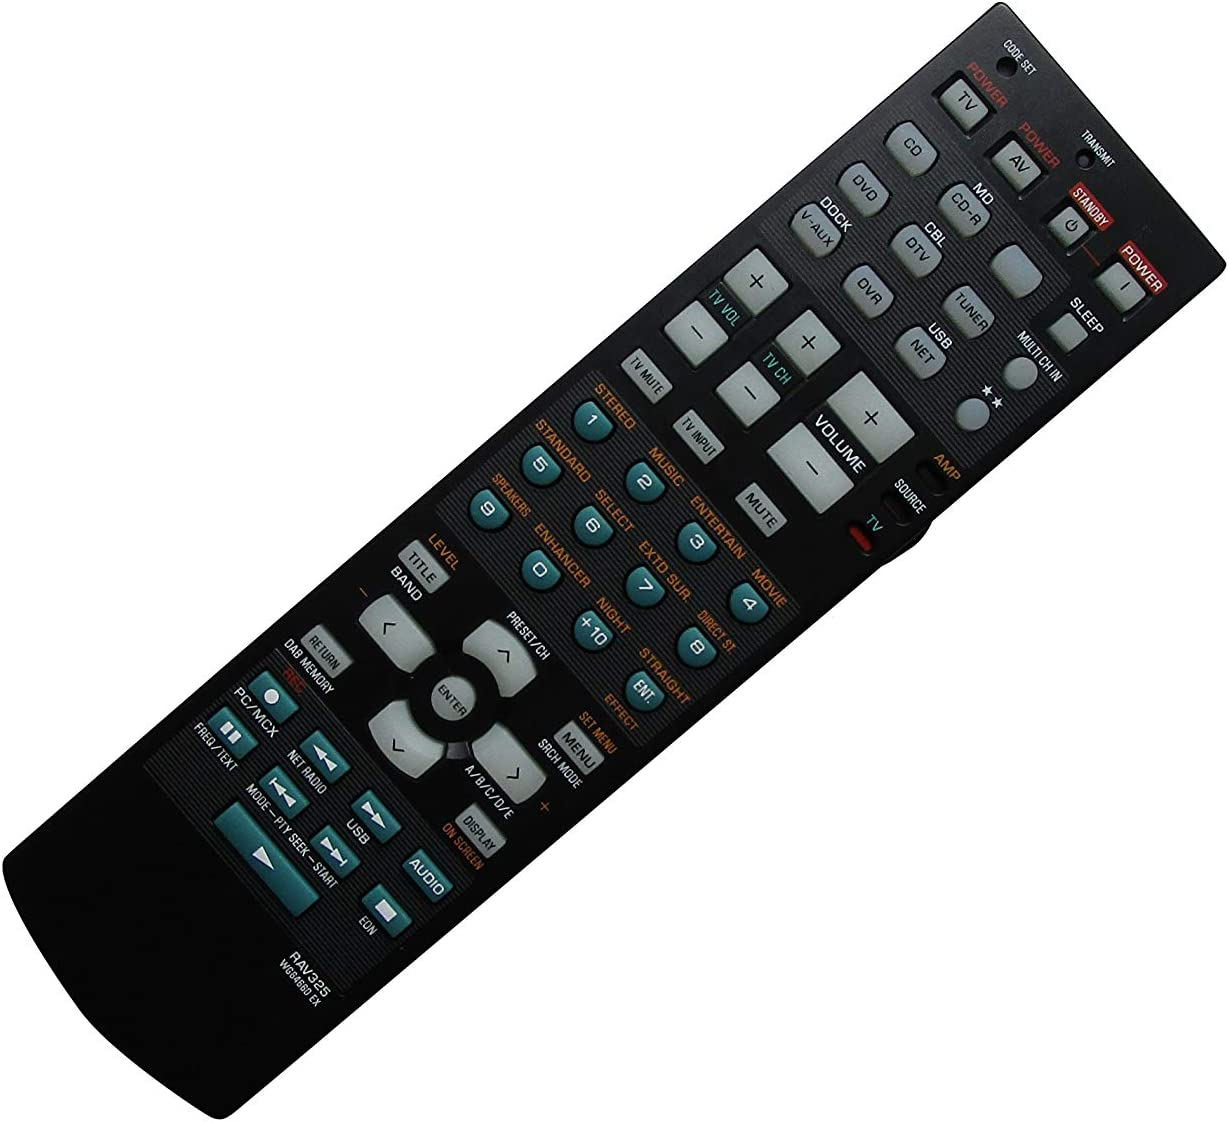 Washington Mall Remote Control safety for Yamaha RAV250 WC552800 RX-V HTR-5750 HTR-5740